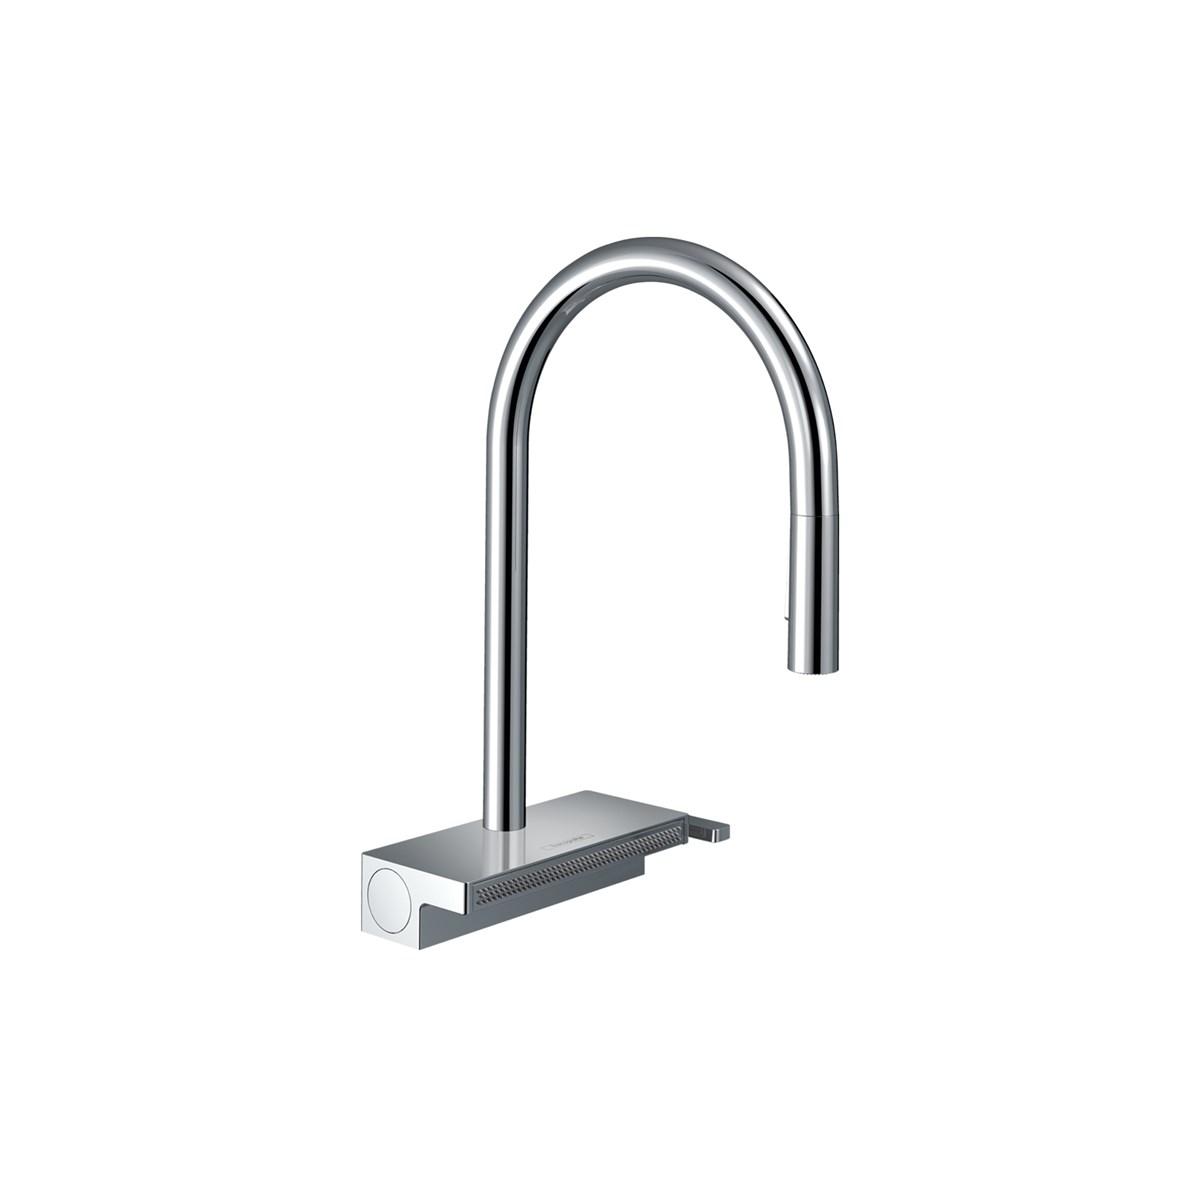 Hansgrohe-Aquno-Select-Kitchen-Mixer-170-73831000-Matisse-1